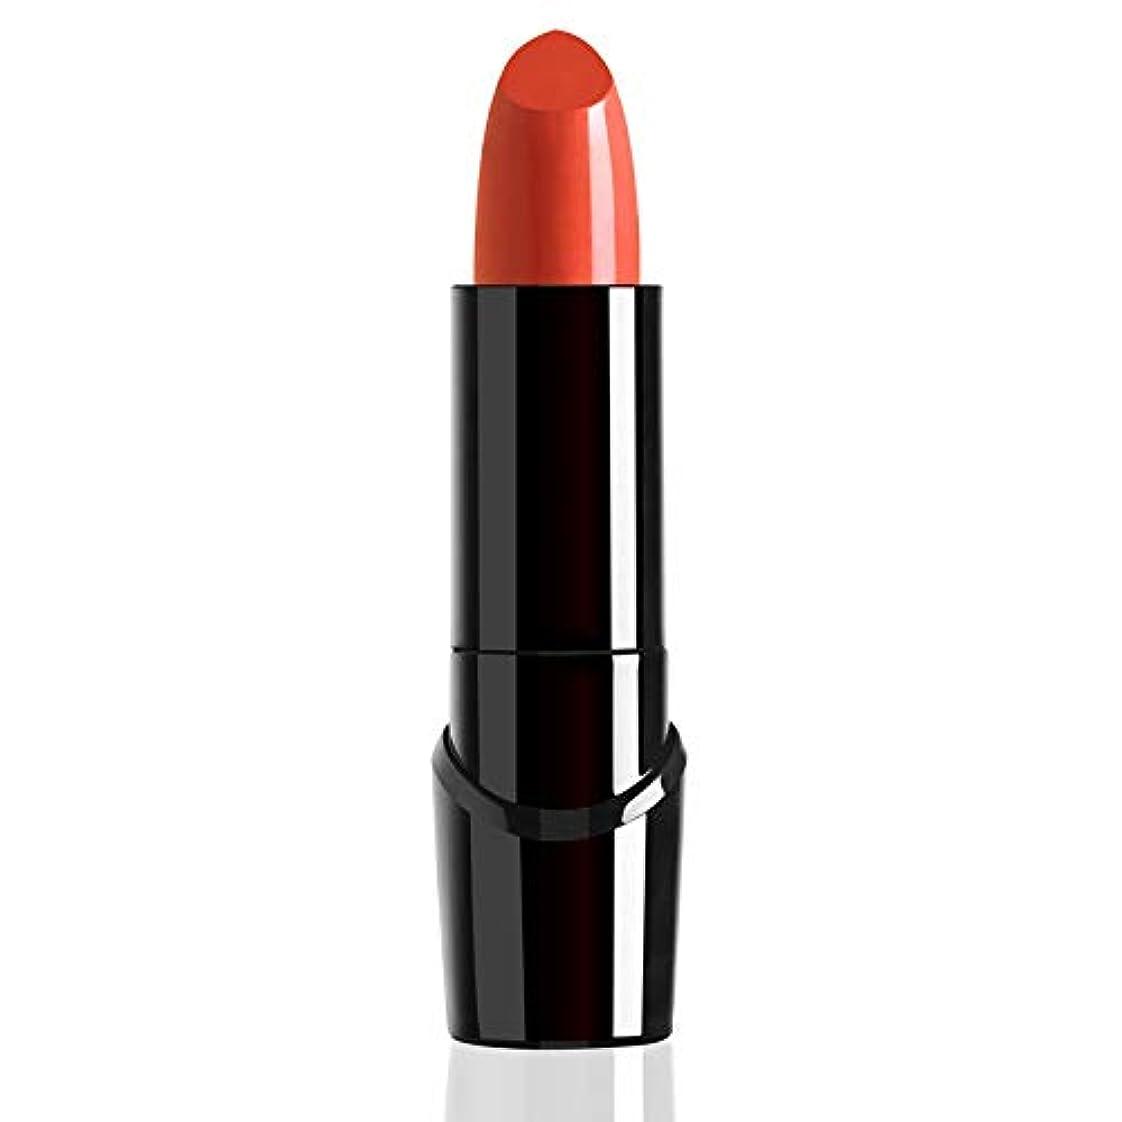 WET N WILD Silk Finish Lipstick - Honolulu Is Calling (並行輸入品)